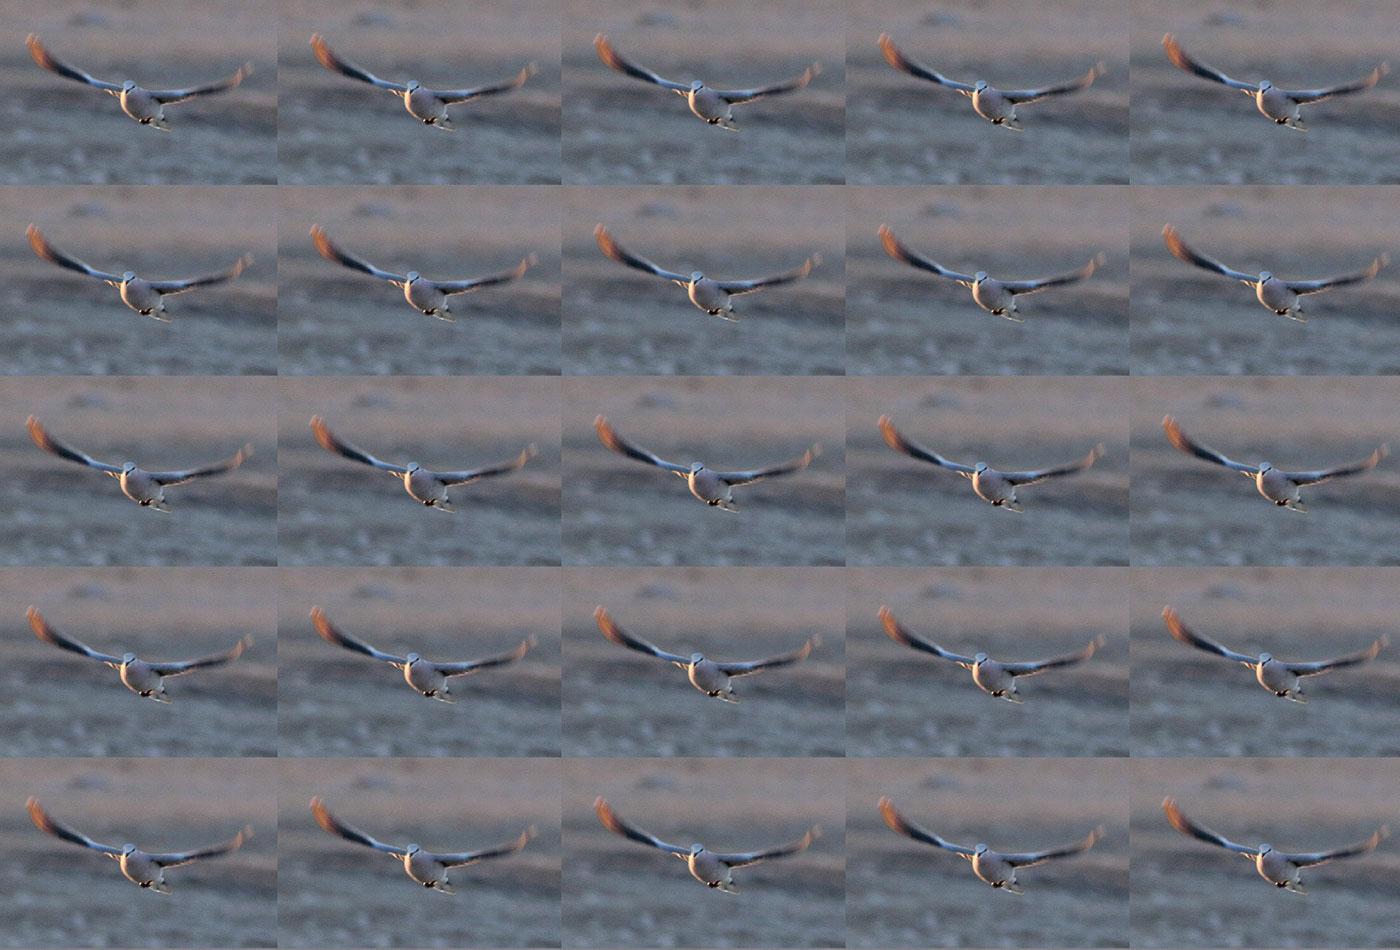 Duplicate birds in flight